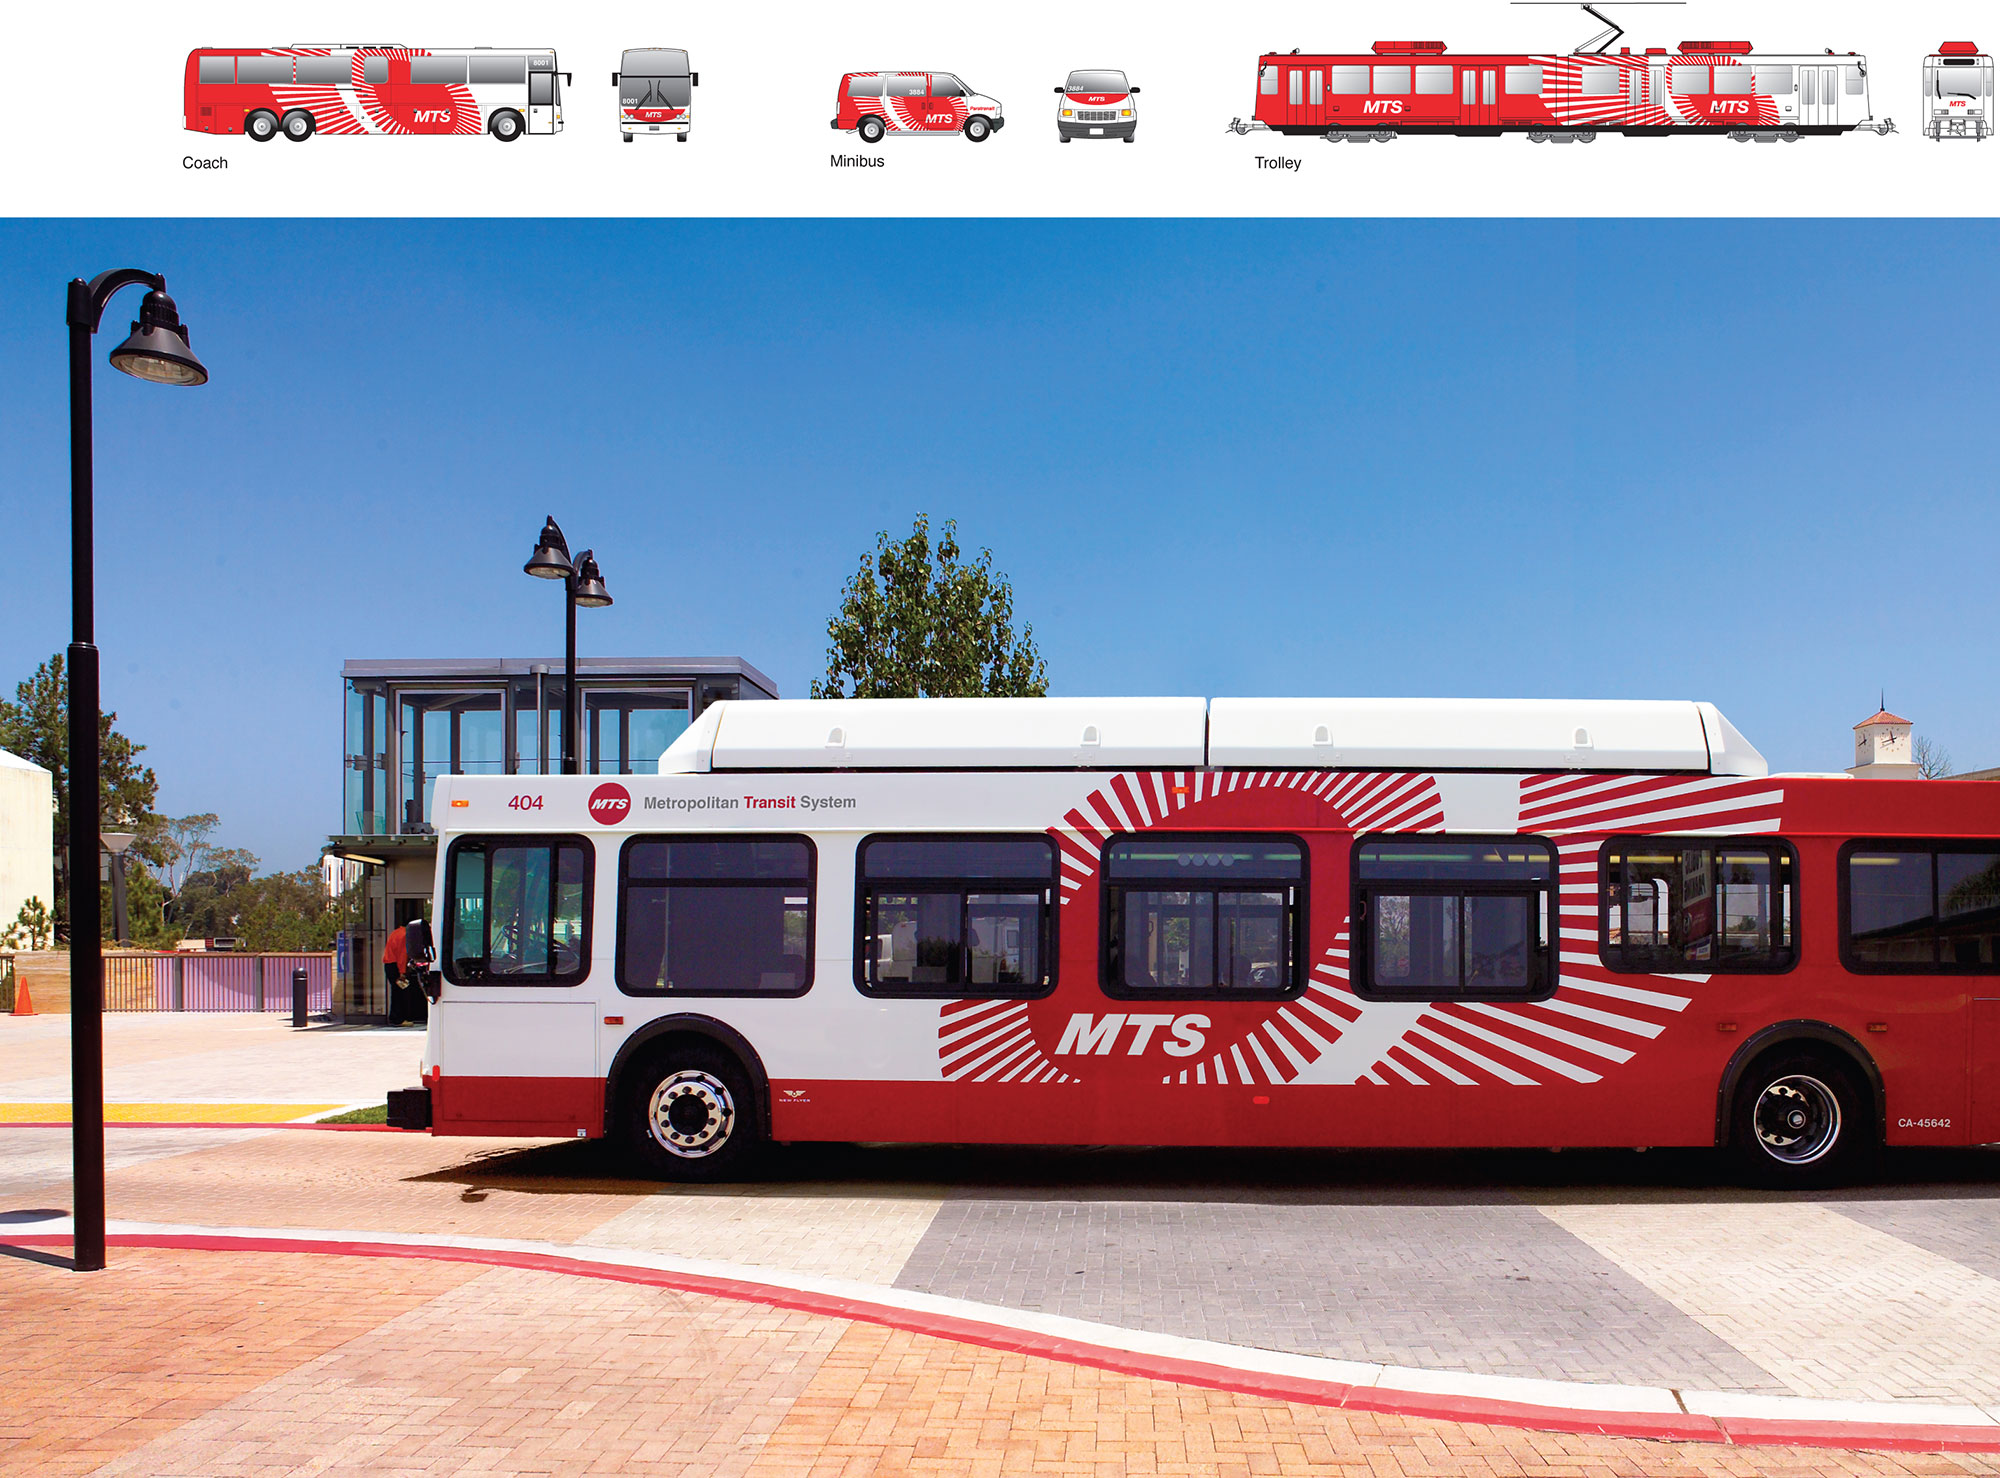 ron-miriello-grafico-mts-bus-san-diego-trolley-design-branding-03.jpg